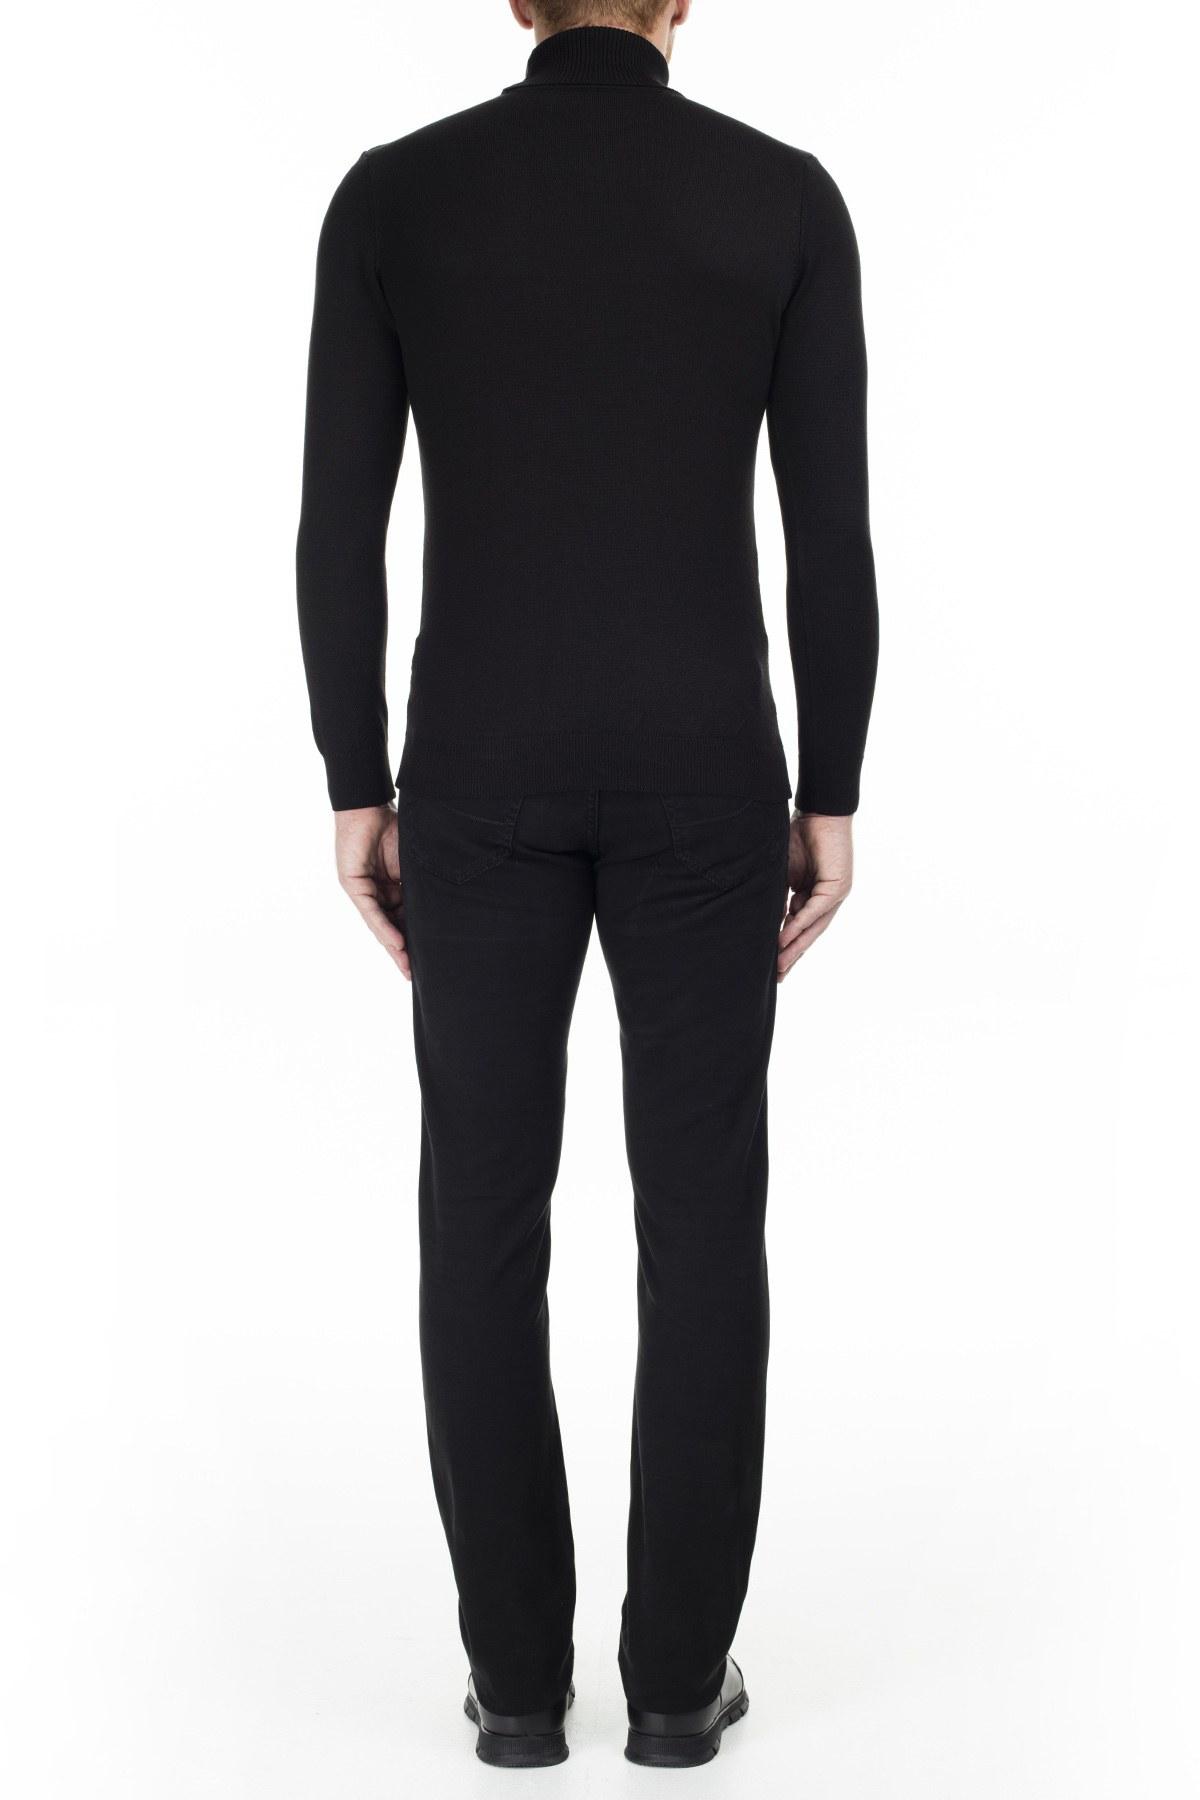 Jacob Cohen Jeans Erkek Pamuklu Pantolon J622 01651S 990 SİYAH